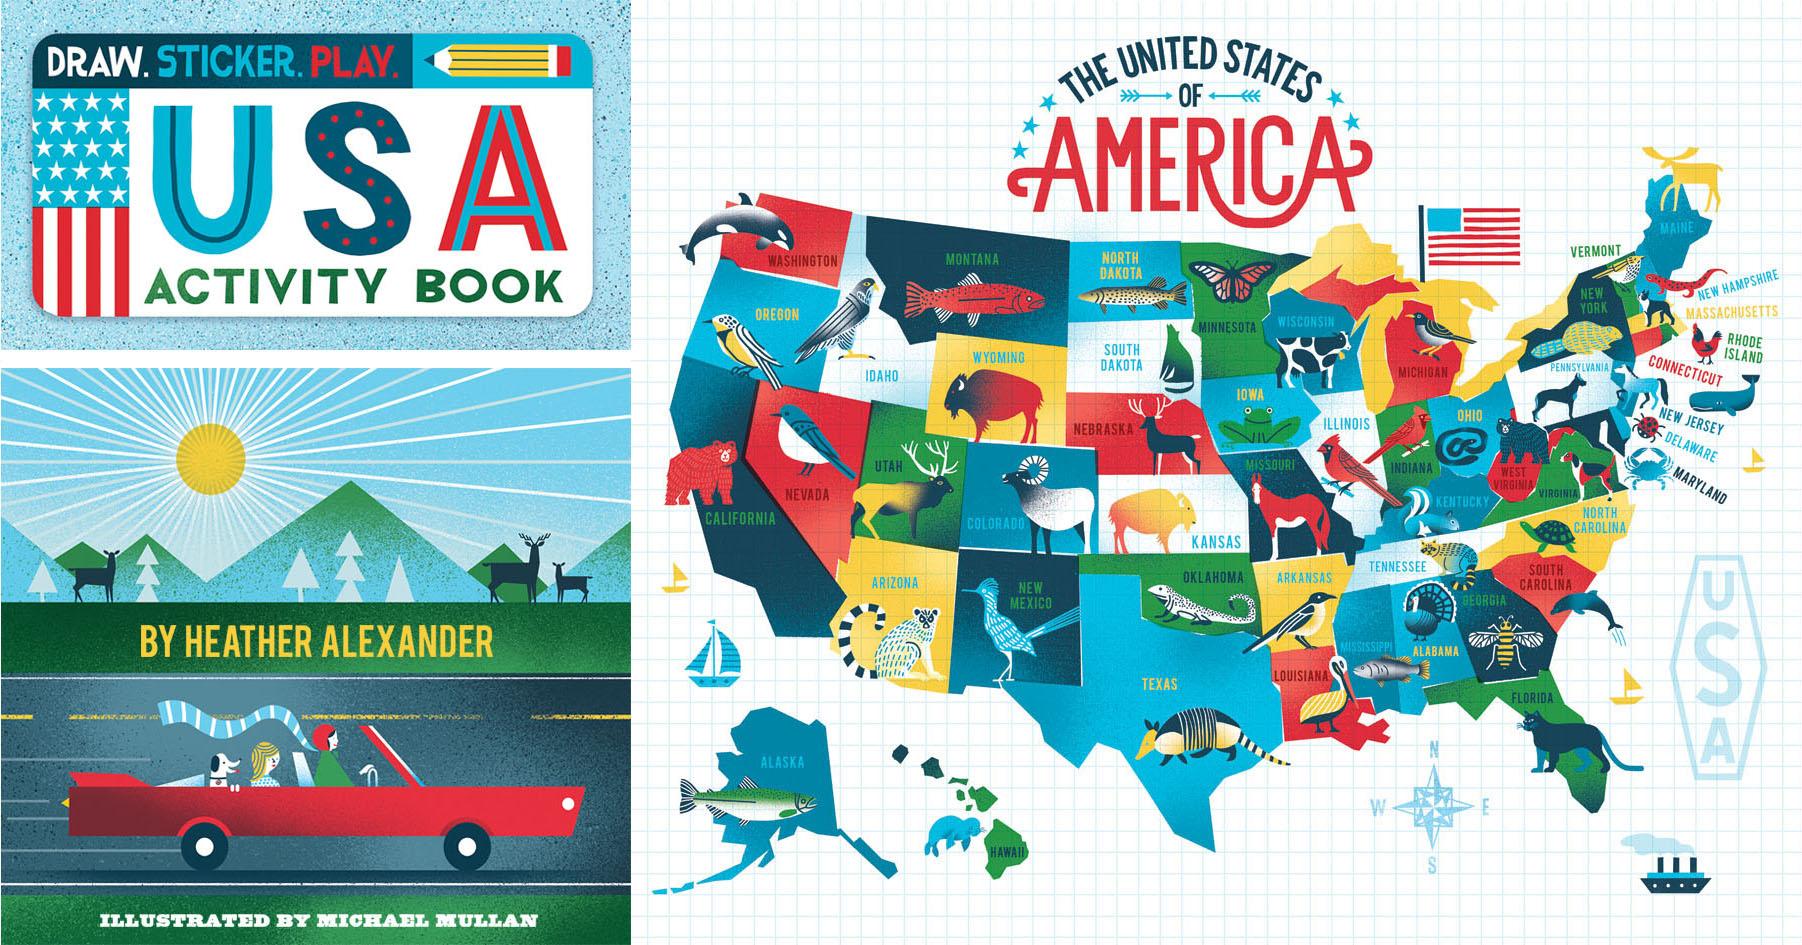 Draw, Sticker, Play USA Activity Book  for Quarto Press + Ivy Kids, UK